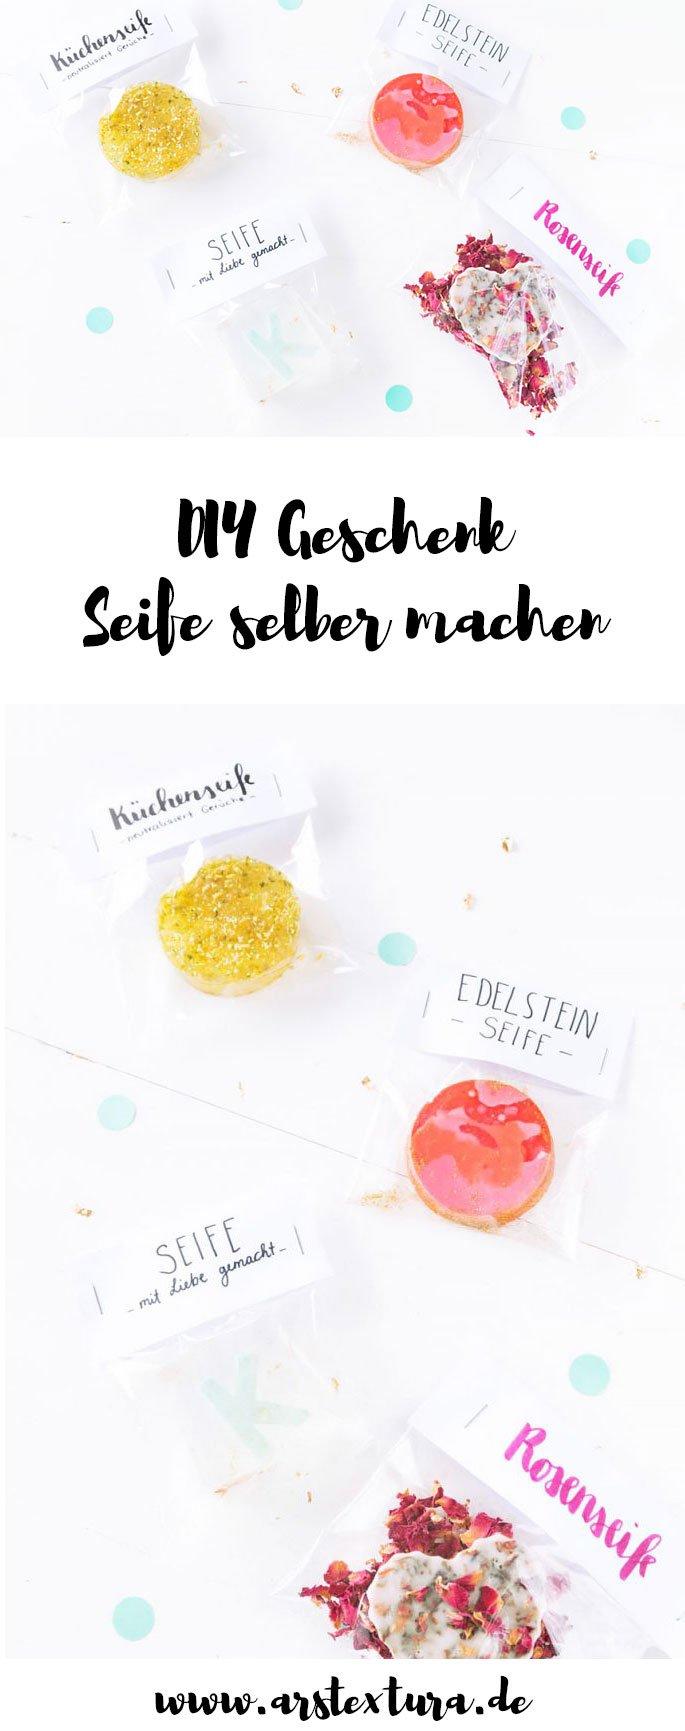 DIY Geschenk: Seife selber machen